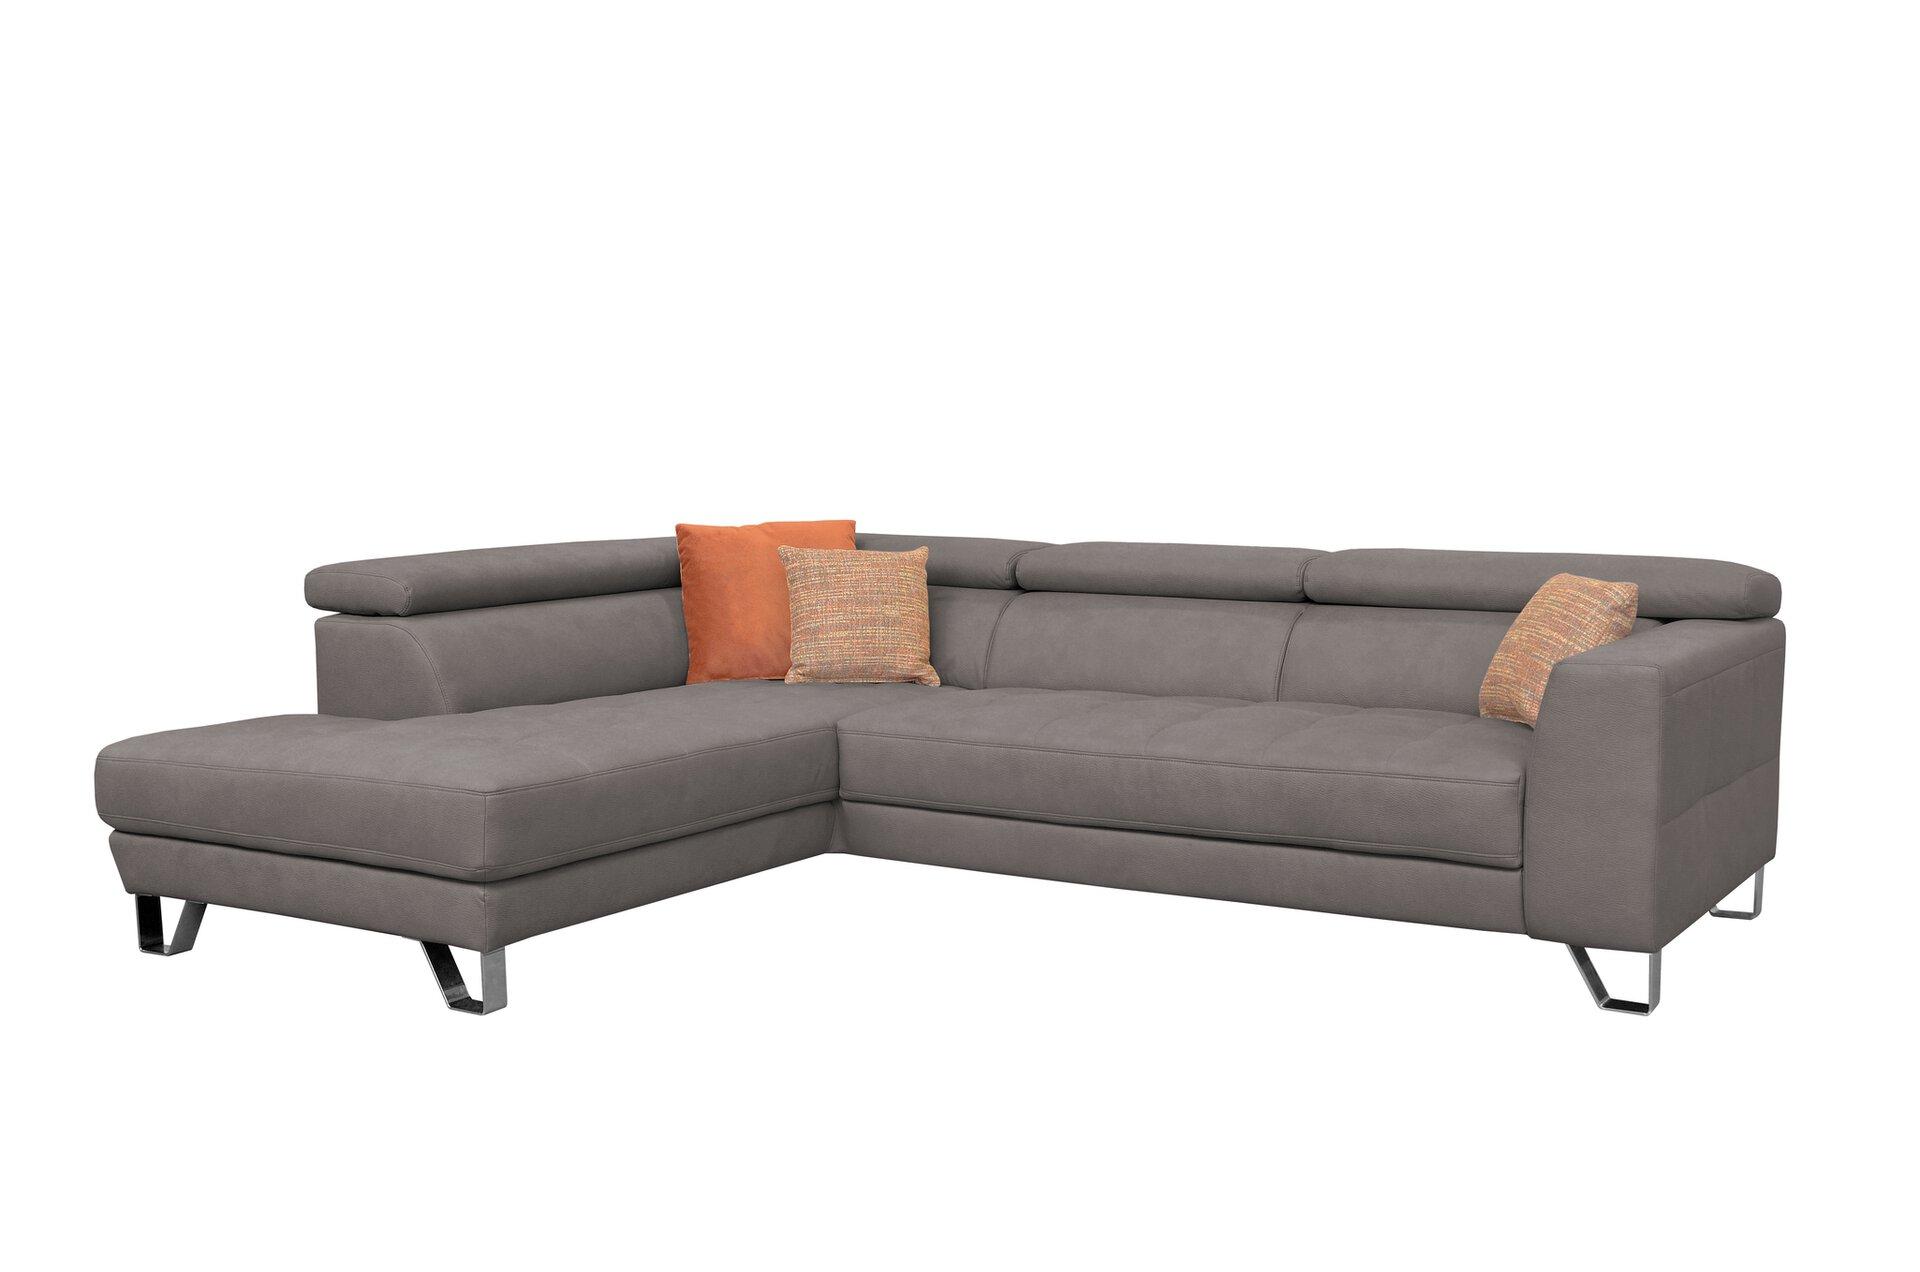 Ecksofa REEVE VITO Vito Textil 293 x 101 x 220 cm